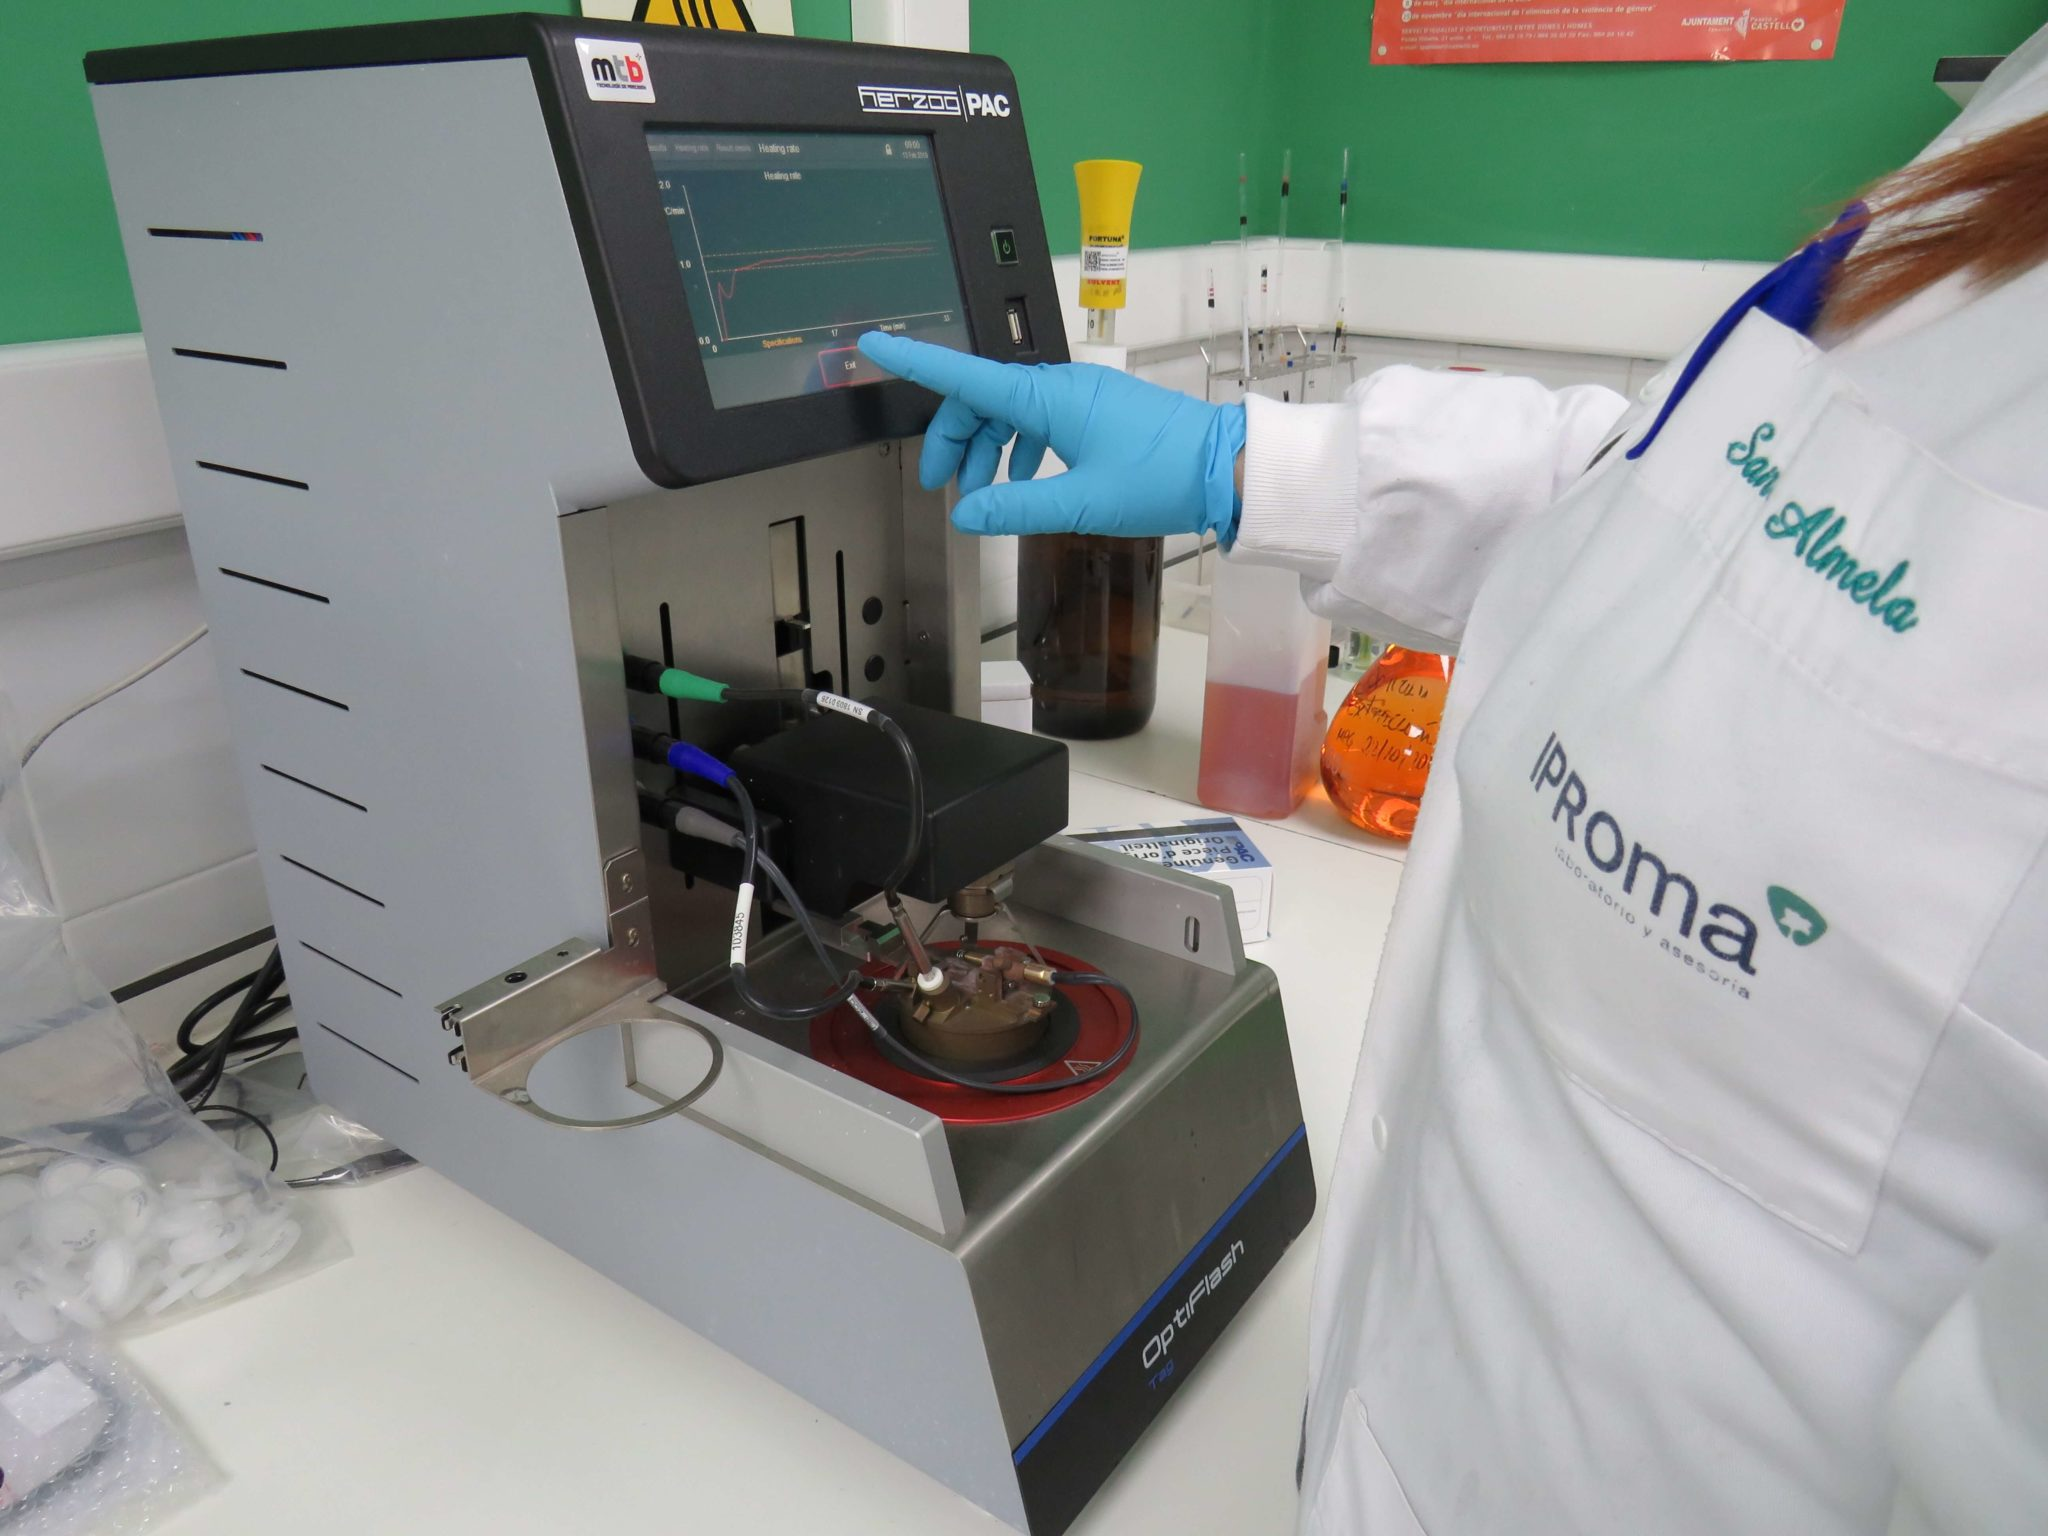 https://www.iproma.com/es/iproma-amplia-su-alcance-de-acreditacion/